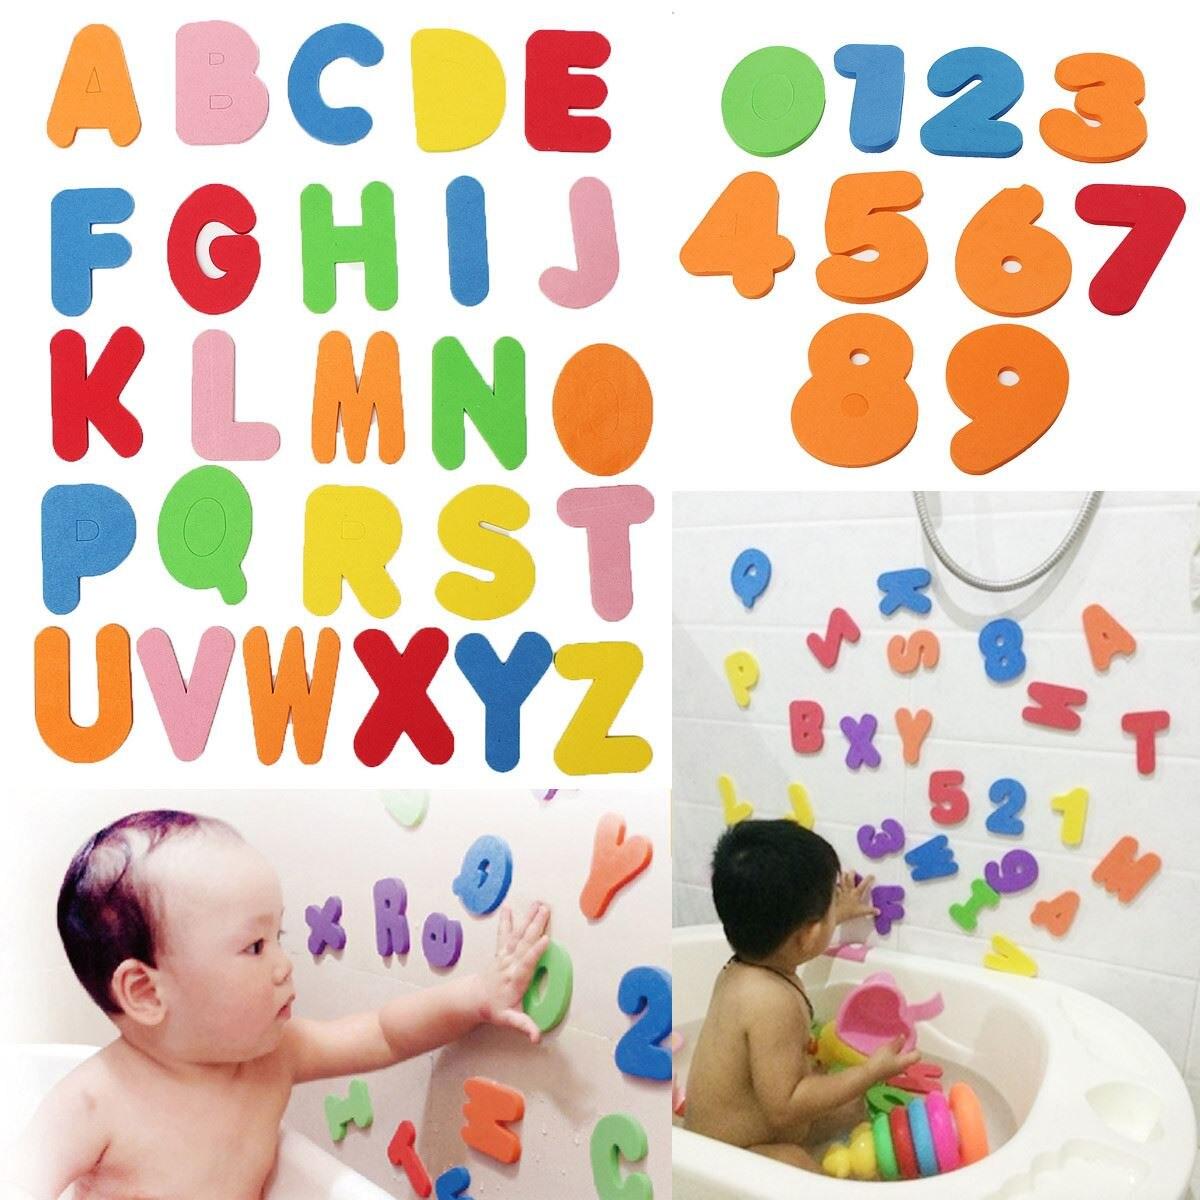 36PCs Alphanumeric Letter Bath Puzzle EVA Kids Baby Toys New Early Educational Kids Bath Funny Toy